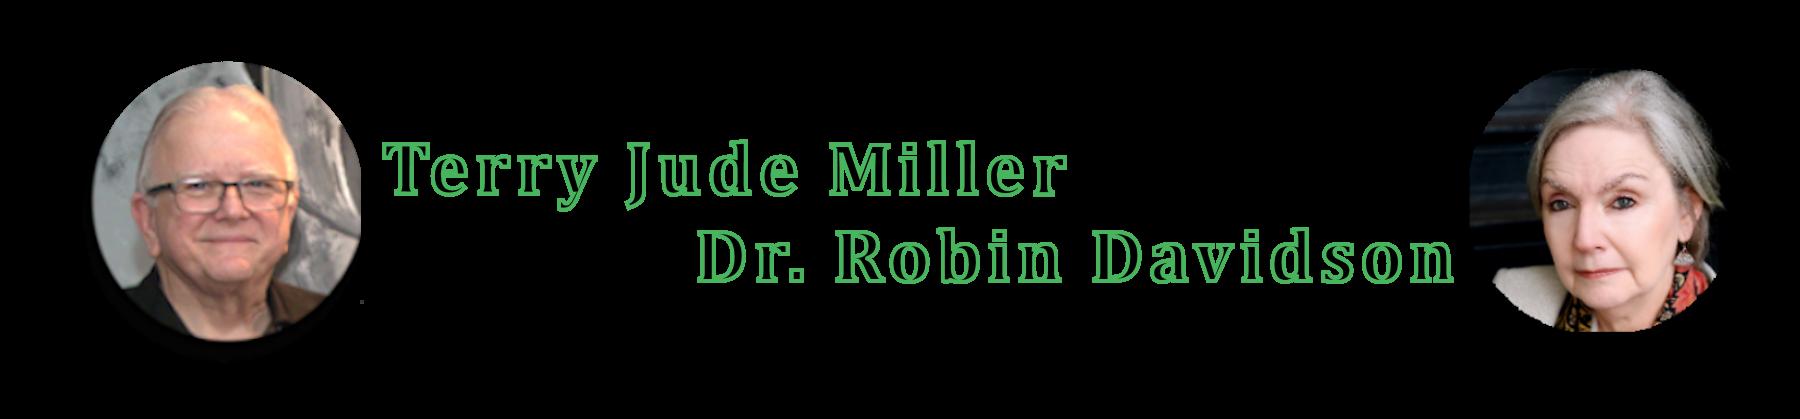 Davidson_Miller